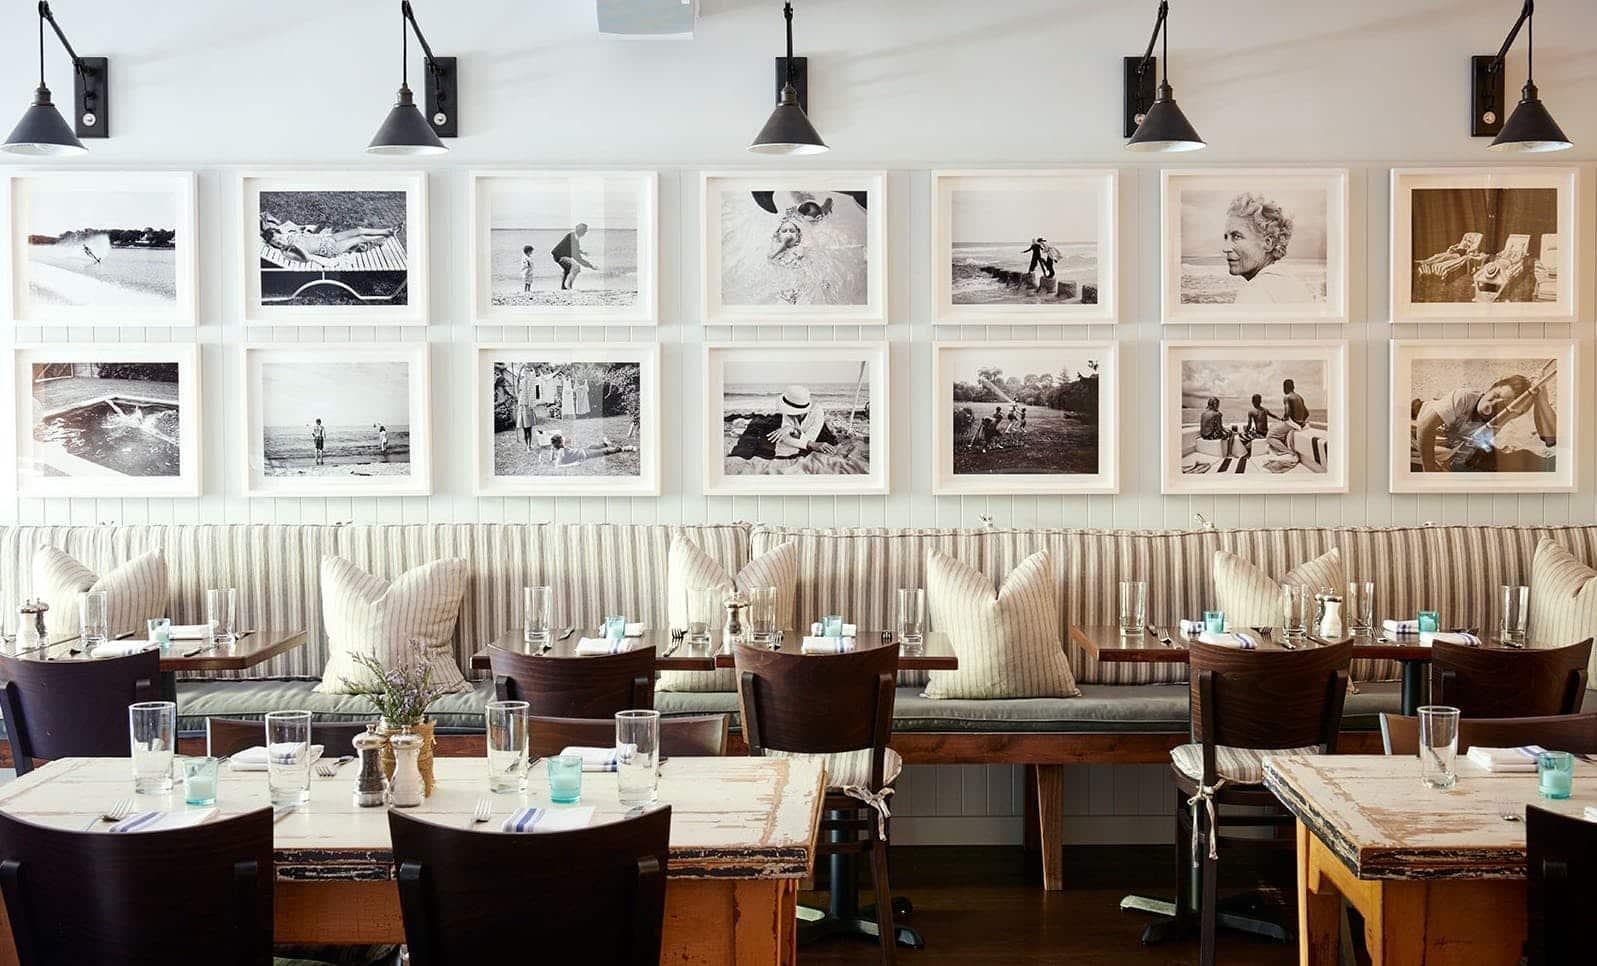 i adore highway restaurant in the hamptons - it's one of my top 10 hamptons destinations! read my whole list - darci hether new york